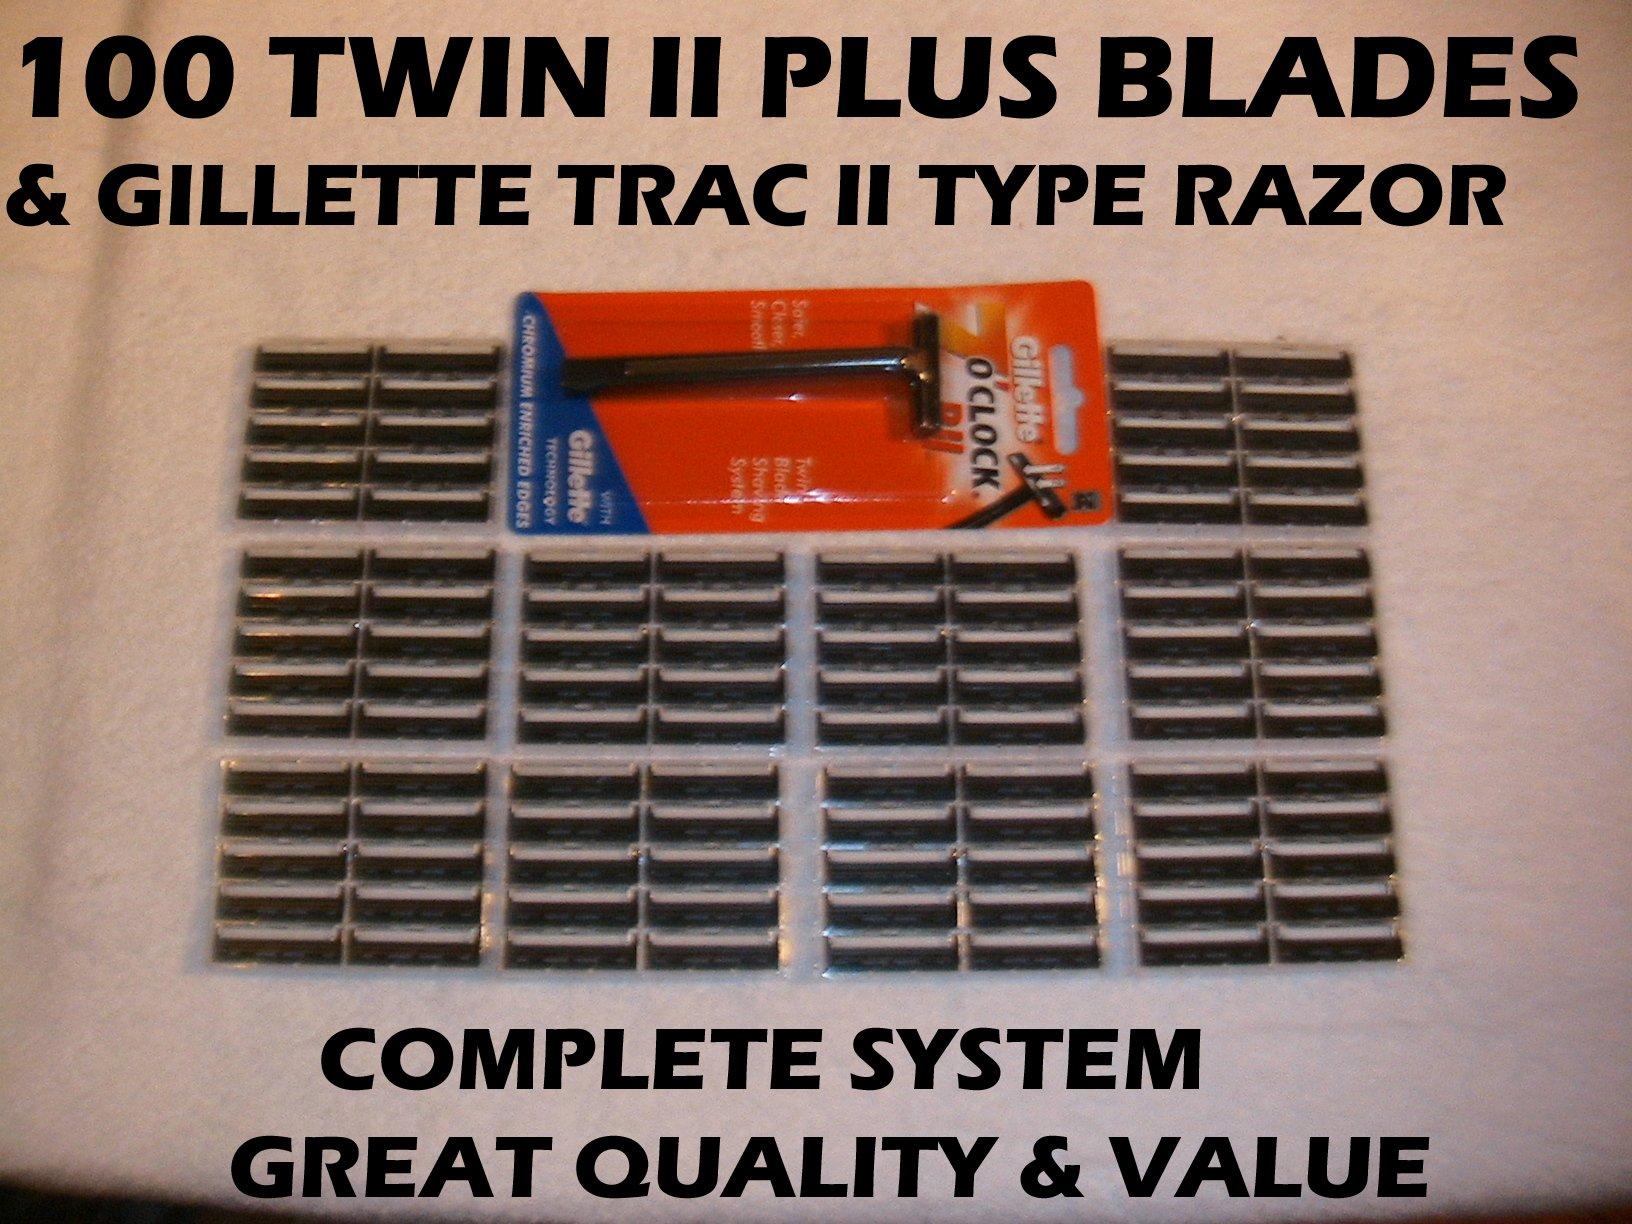 Personna Women's Gentle Touch 100 Twin II Plus Blades & Fixed Head Razor